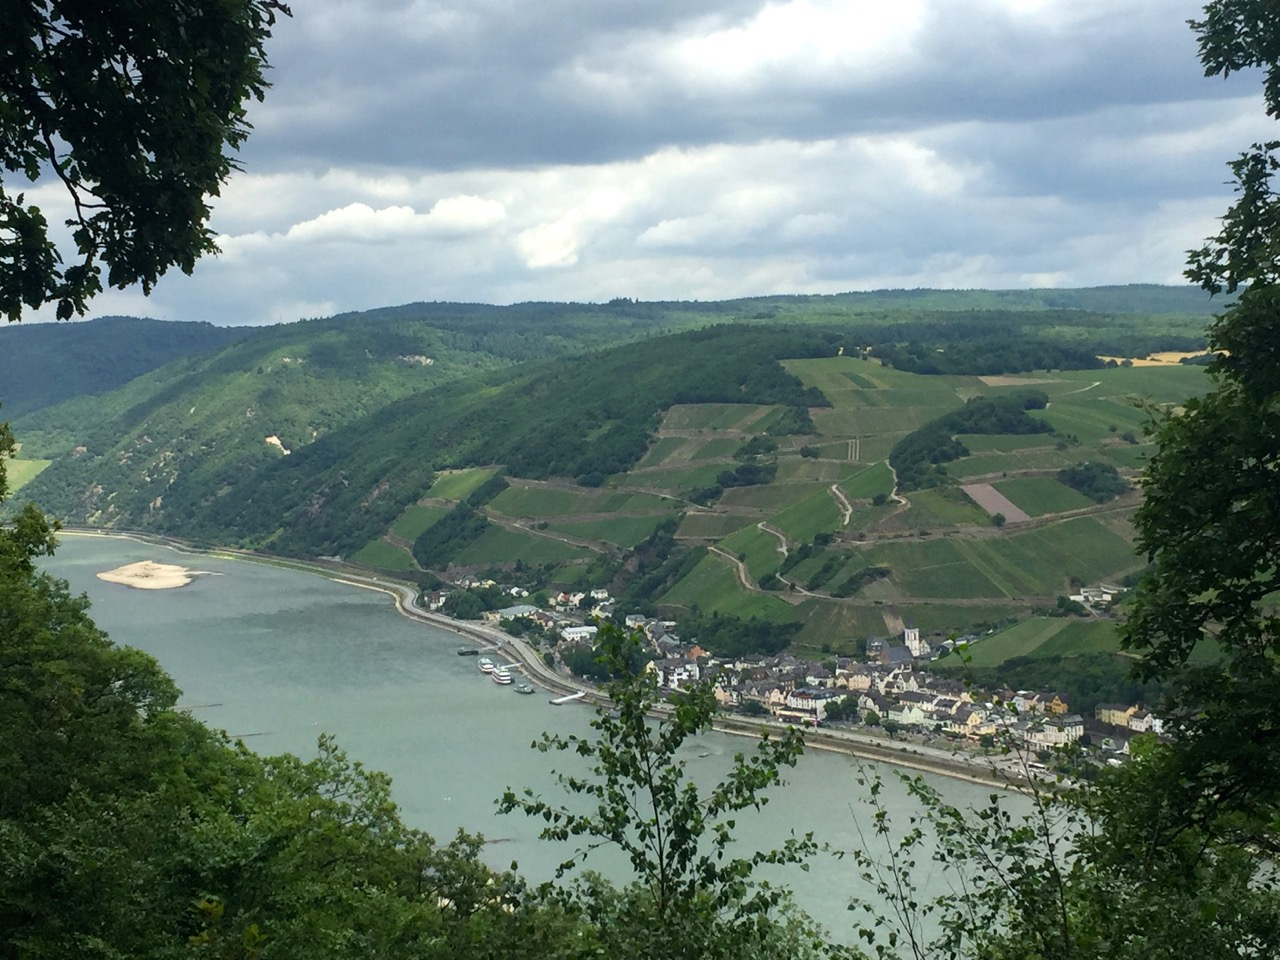 Wandern auf dem Rheinburgenweg